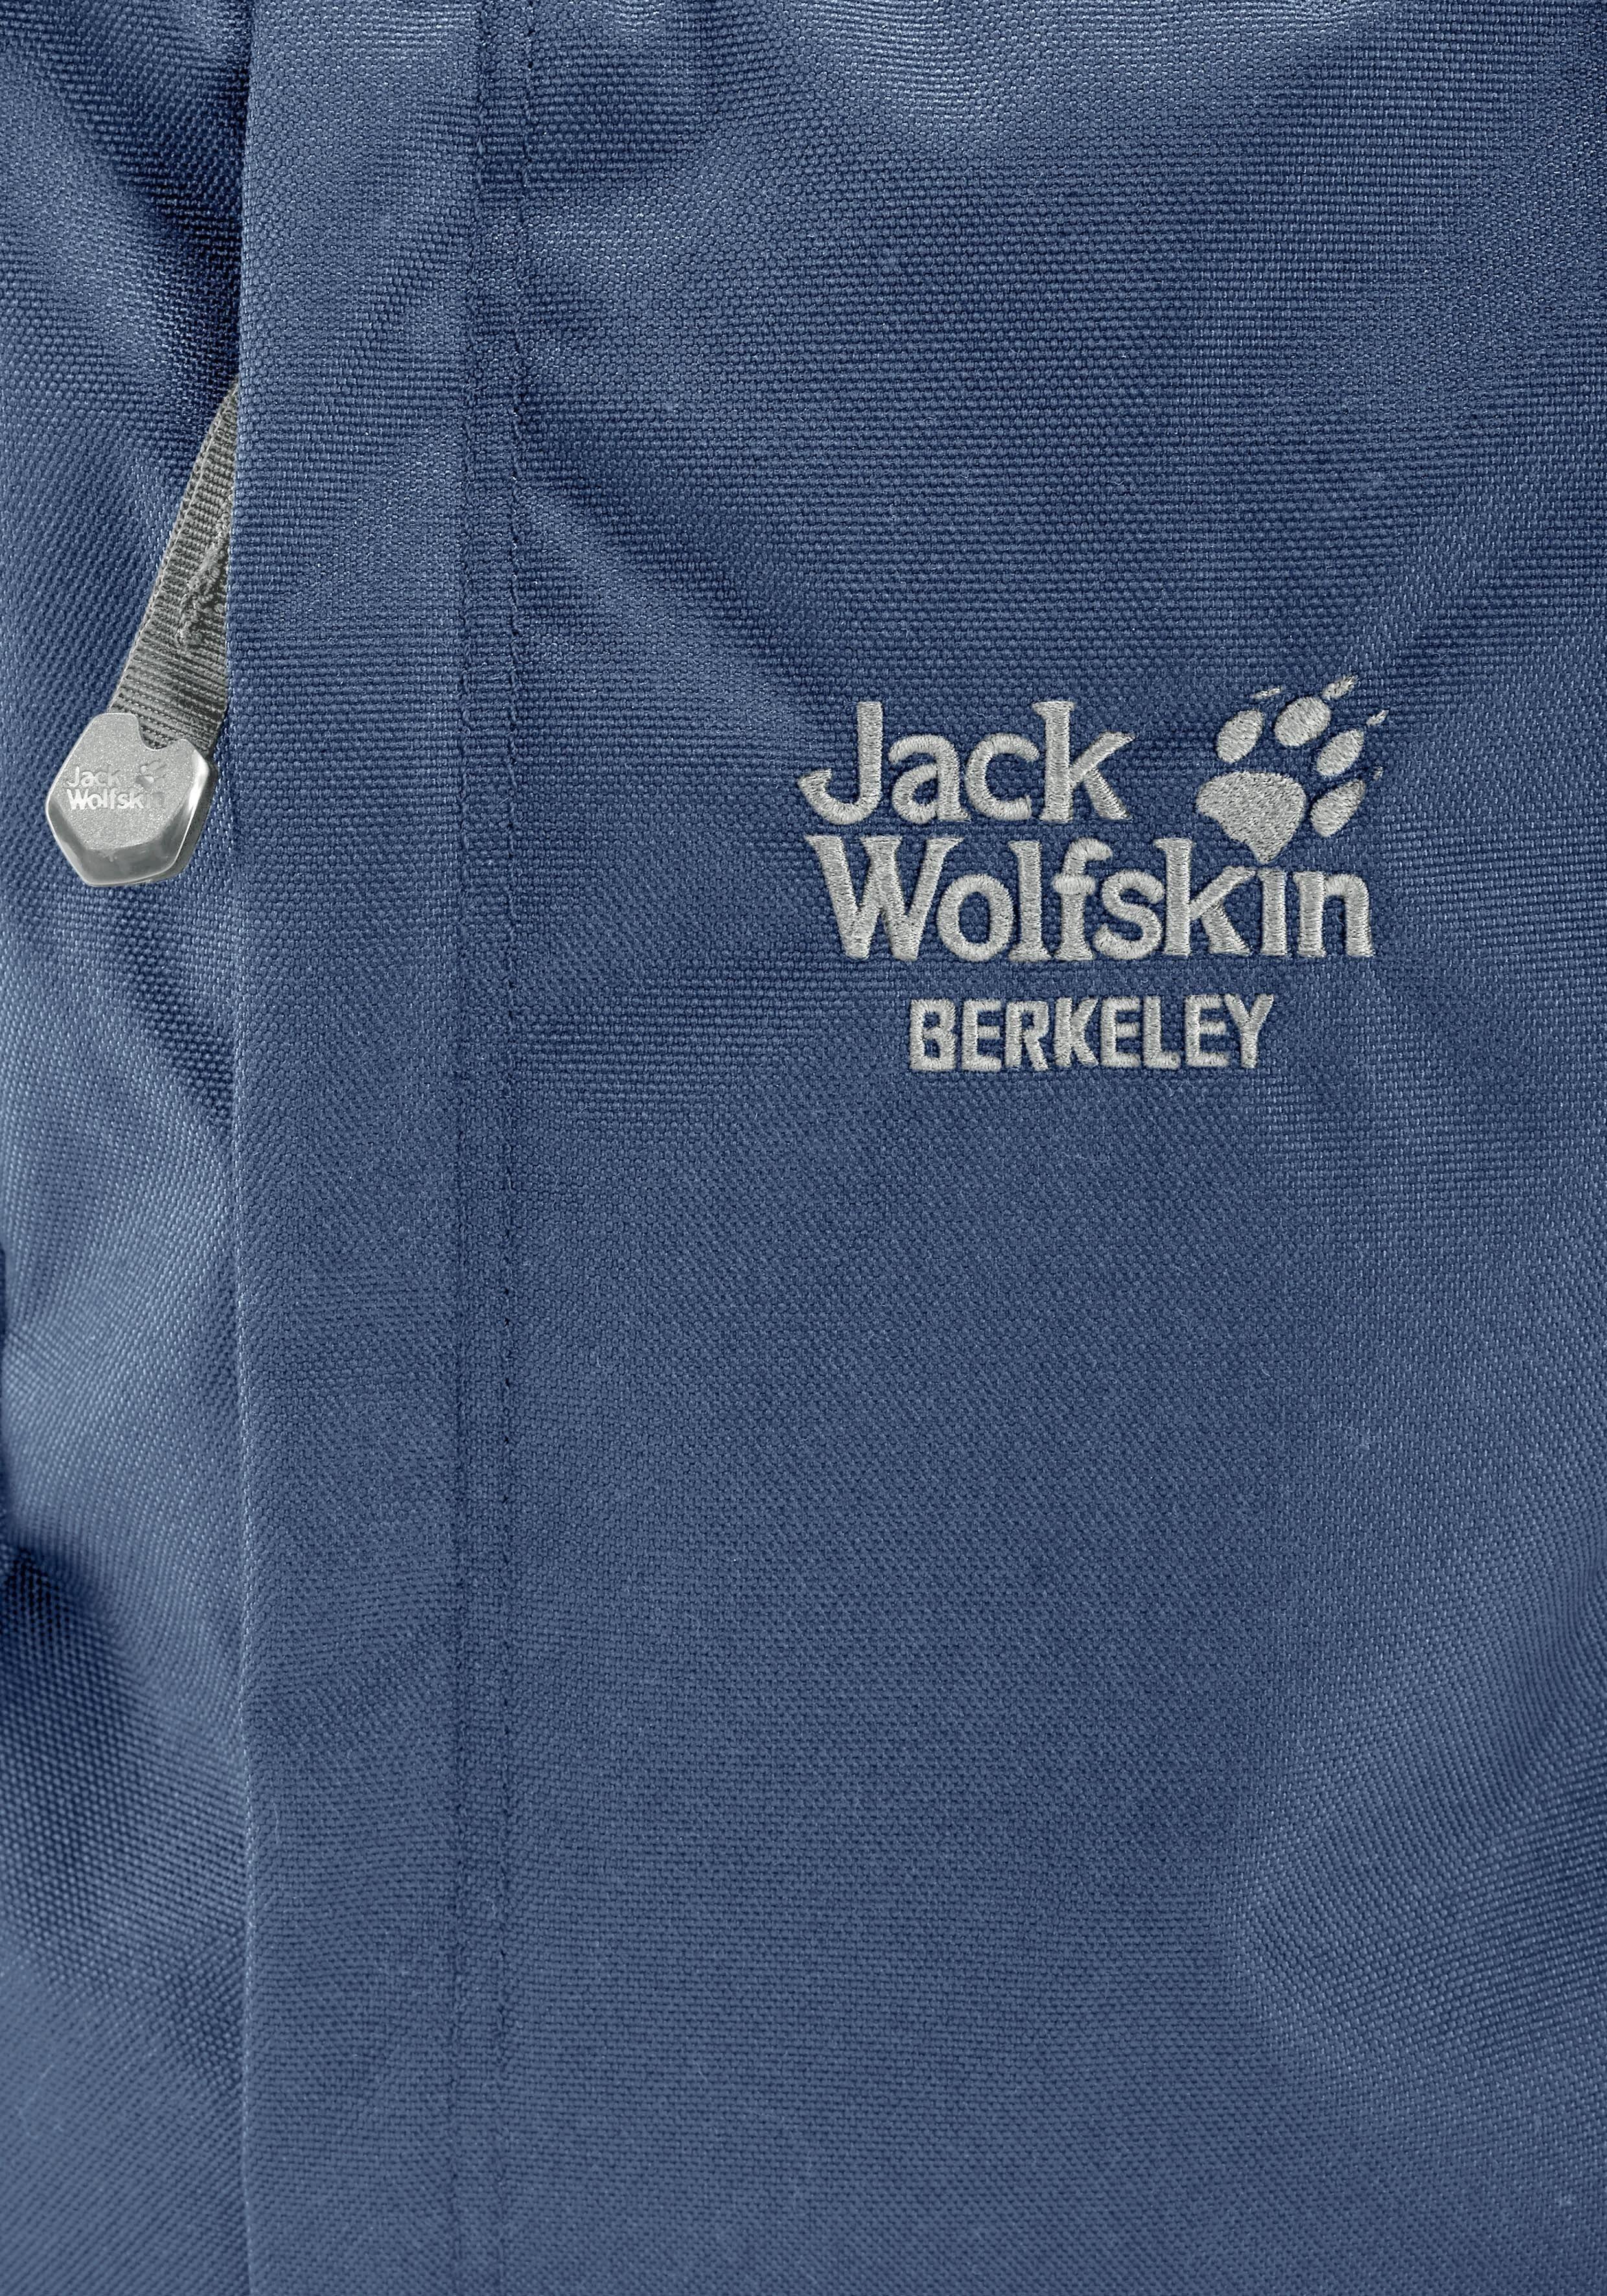 Wolfskin »berkeley« Jack »berkeley« Jack Daypack Wolfskin Jack Daypack Daypack Jack »berkeley« Wolfskin qPPrptw